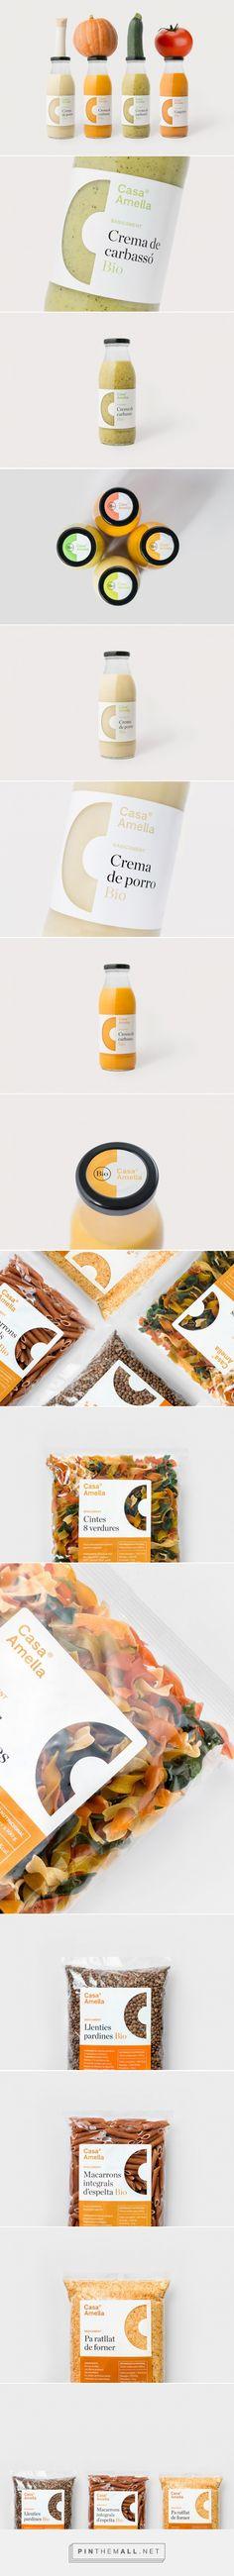 Casa Amella packaging designed by Bisgràfic - http://www.packagingoftheworld.com/2015/10/casa-amella.html